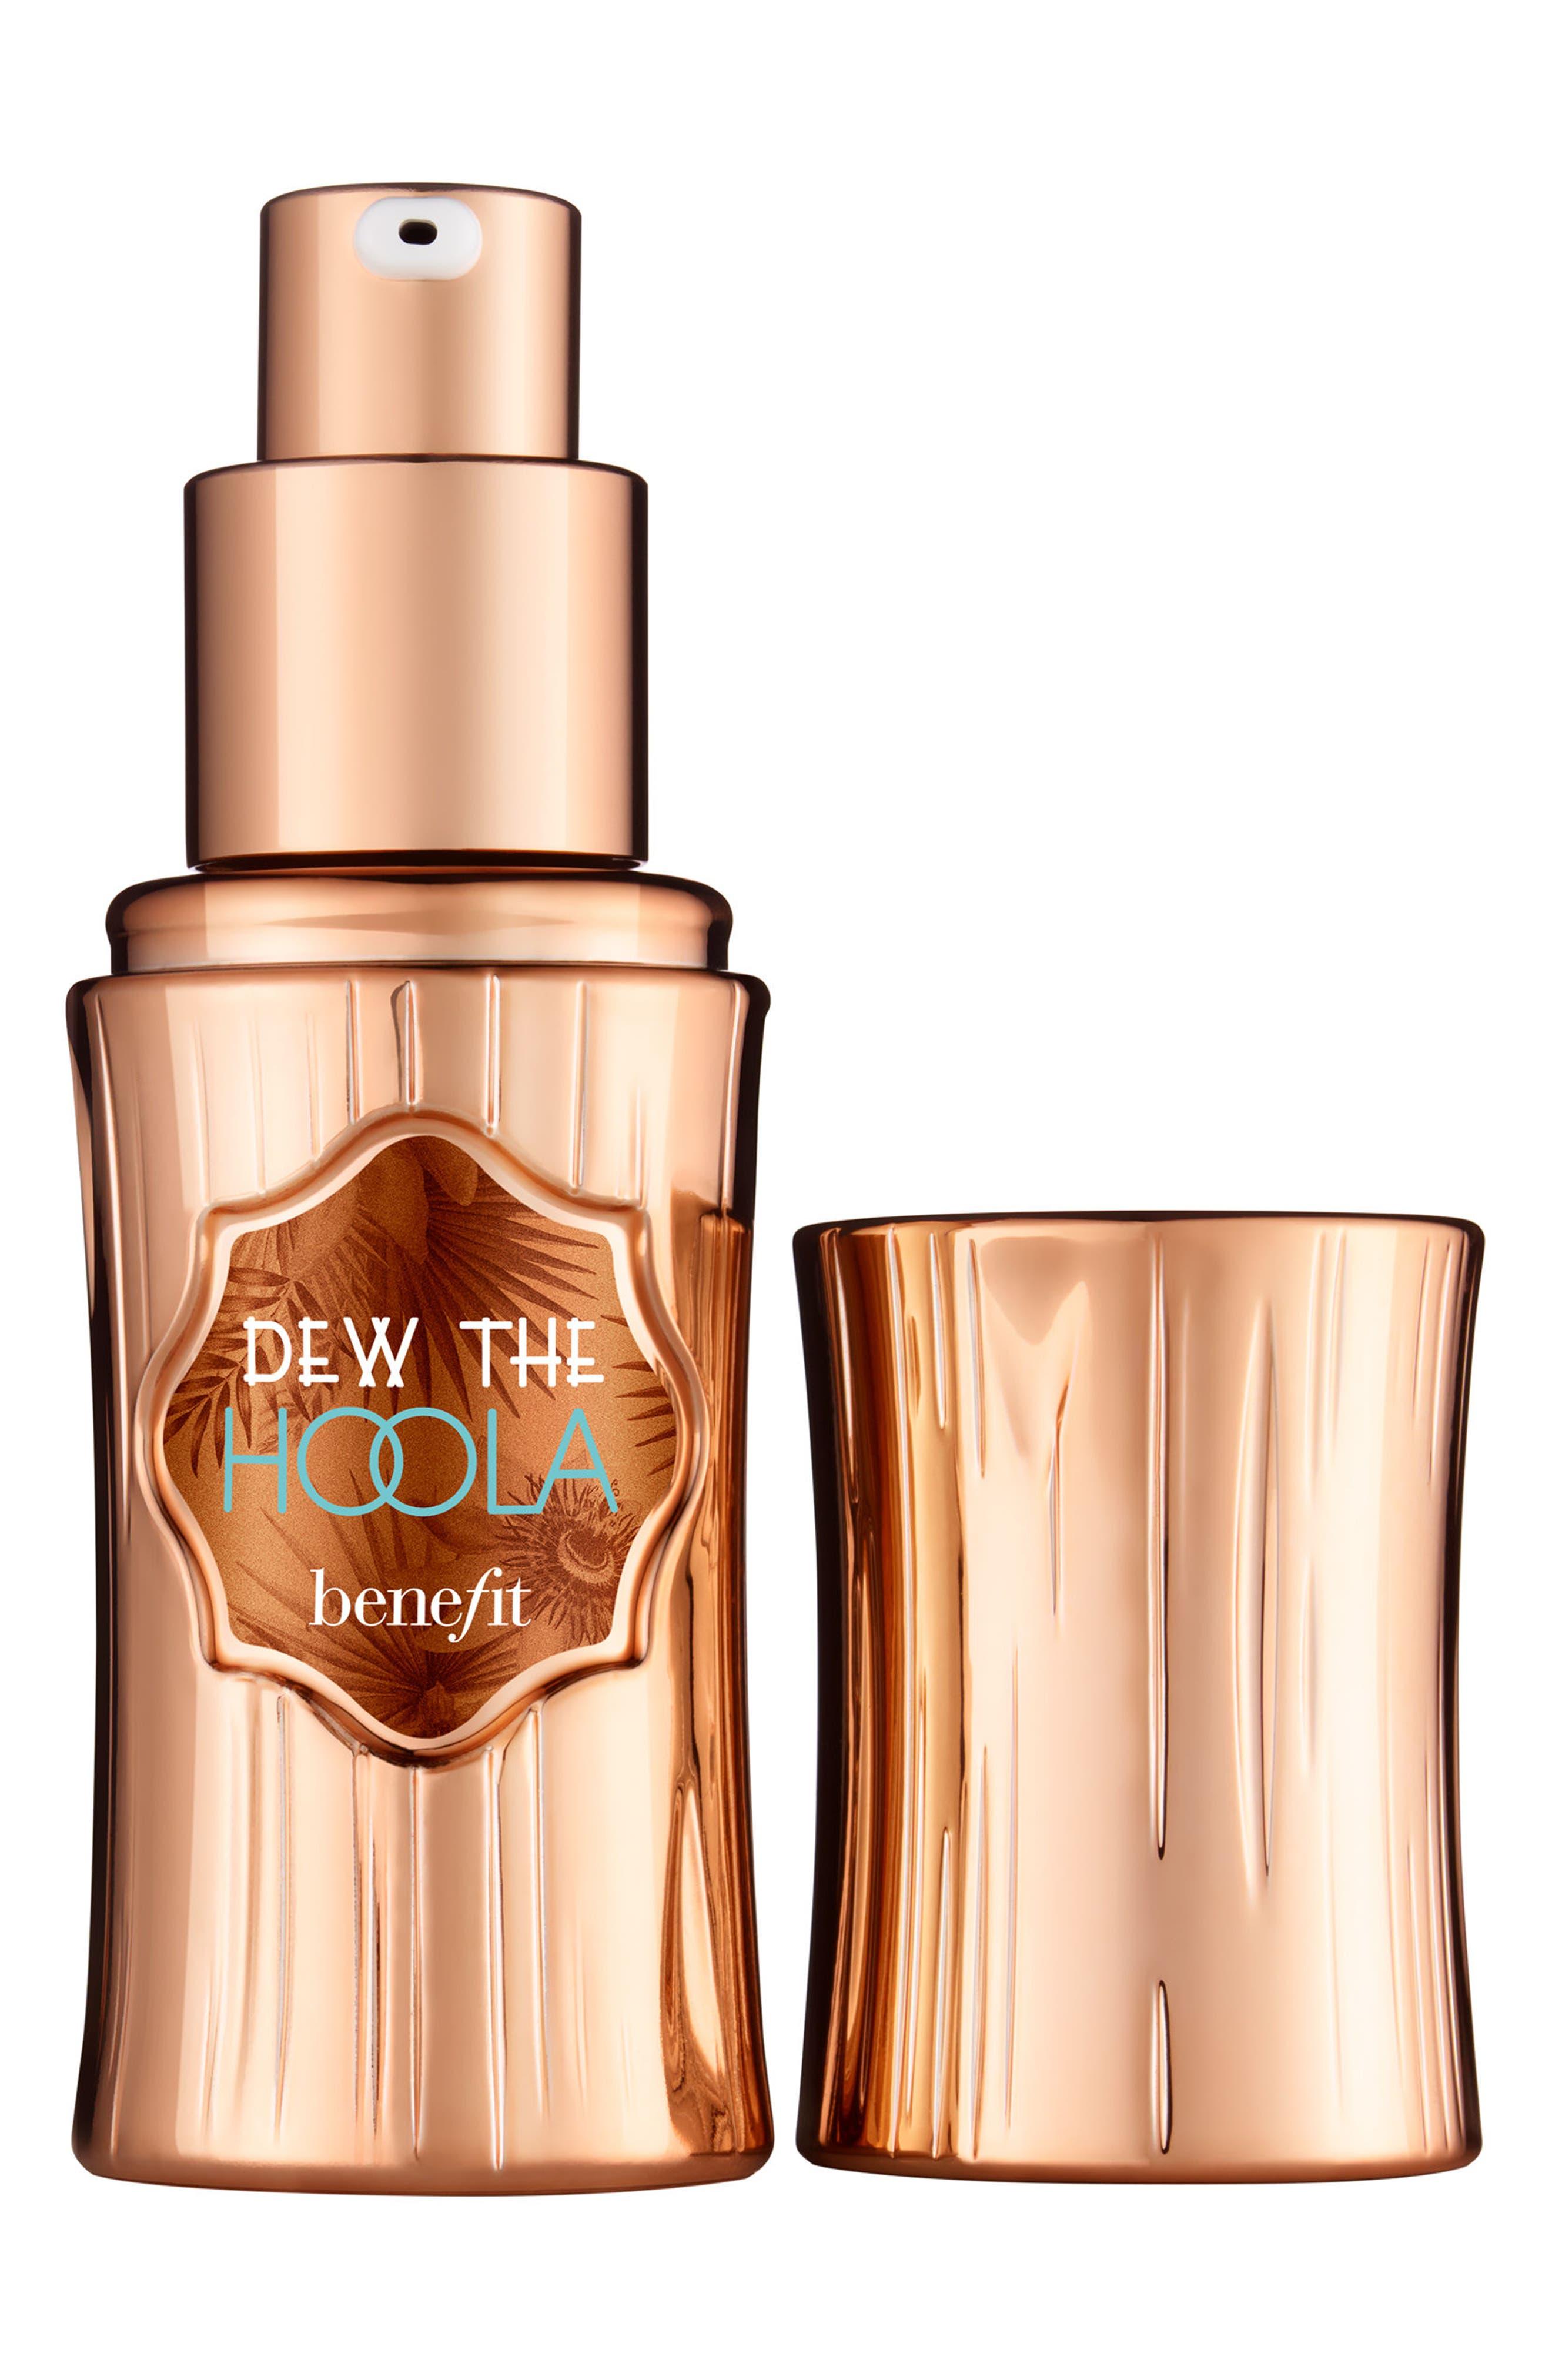 Alternate Image 1 Selected - Benefit Dew the Hoola Matte Liquid Bronzer